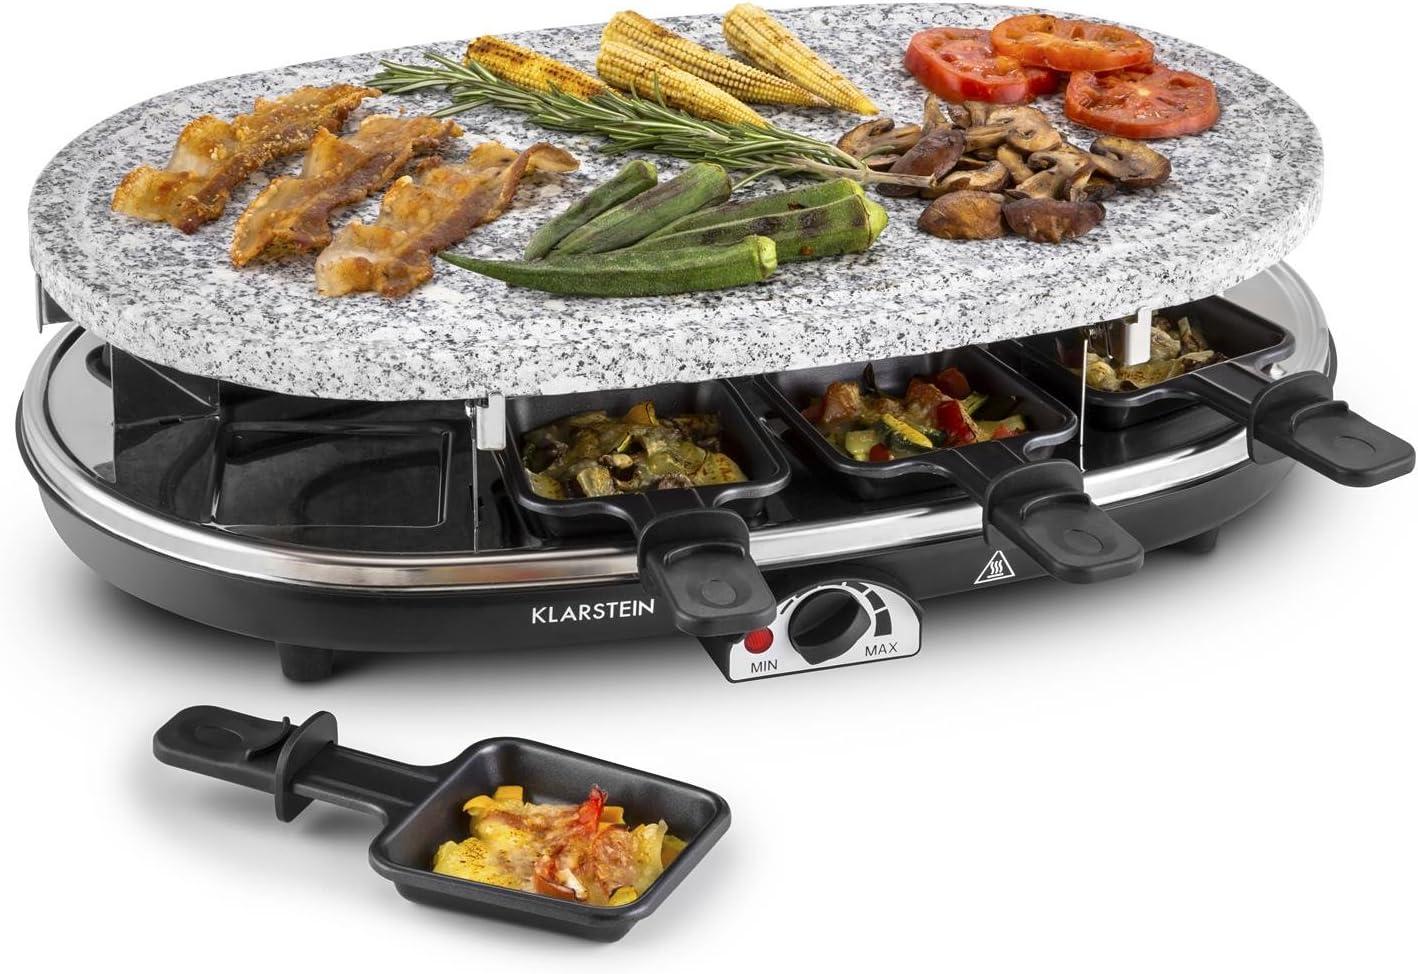 Klarstein All-U-Can Steaklette Raclette - Parrilla de mesa ...